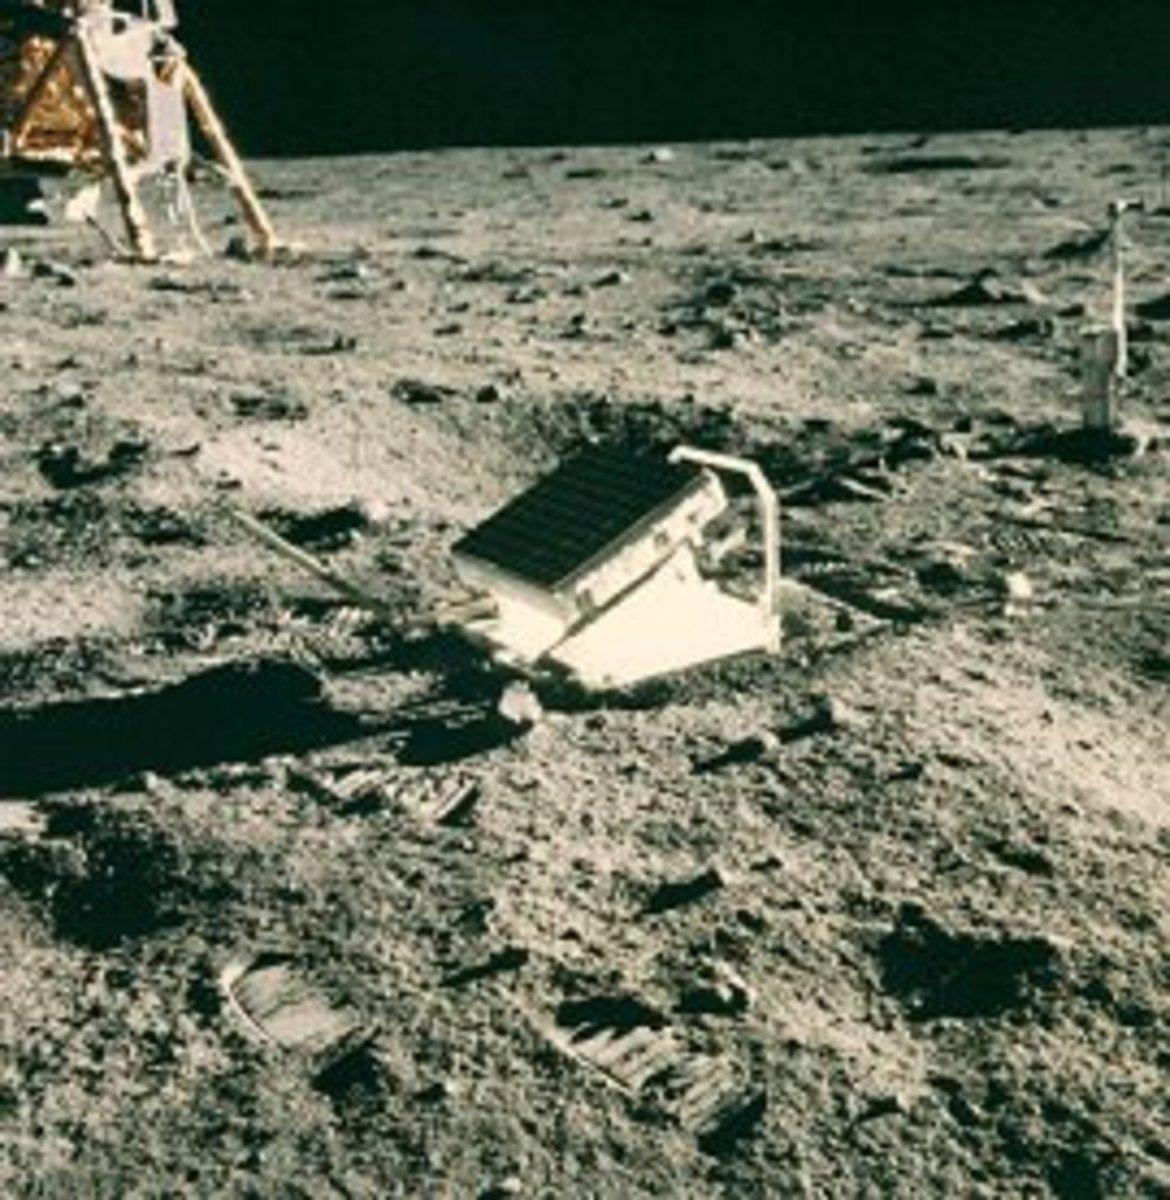 Mirrors on the moon. Lunar laser ranging retroreflector array.